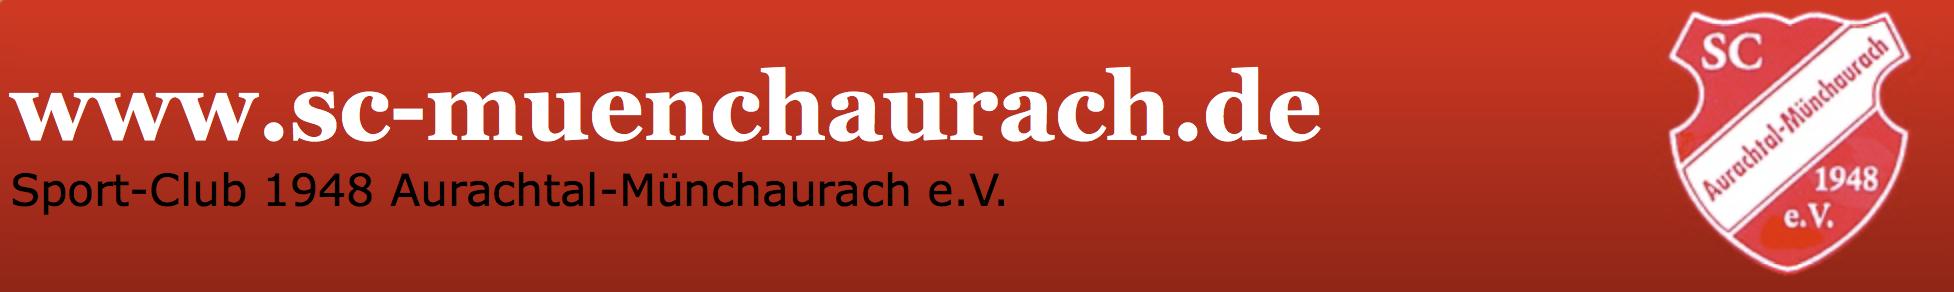 SC Münchaurach 1948 e.V. Logo